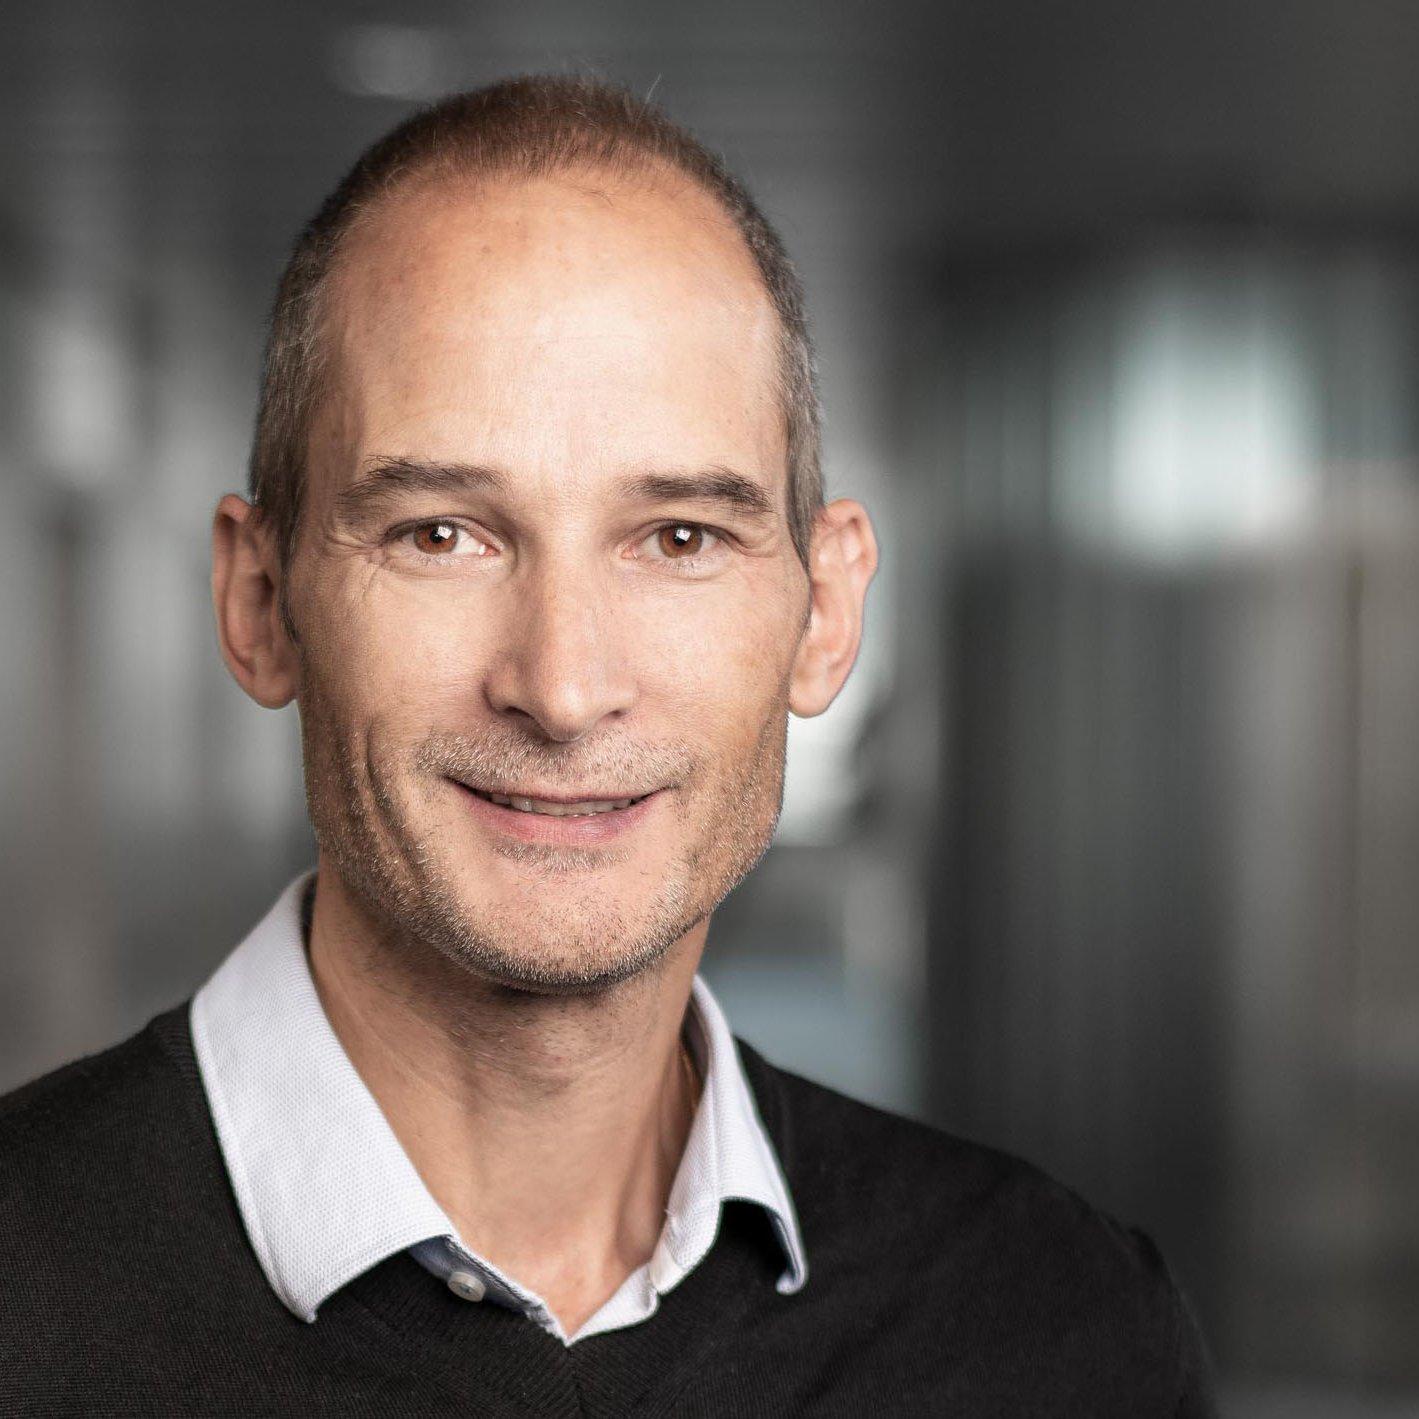 Galenica Kunden Referenz Intranet LiveTiles Patrick Fehlmann